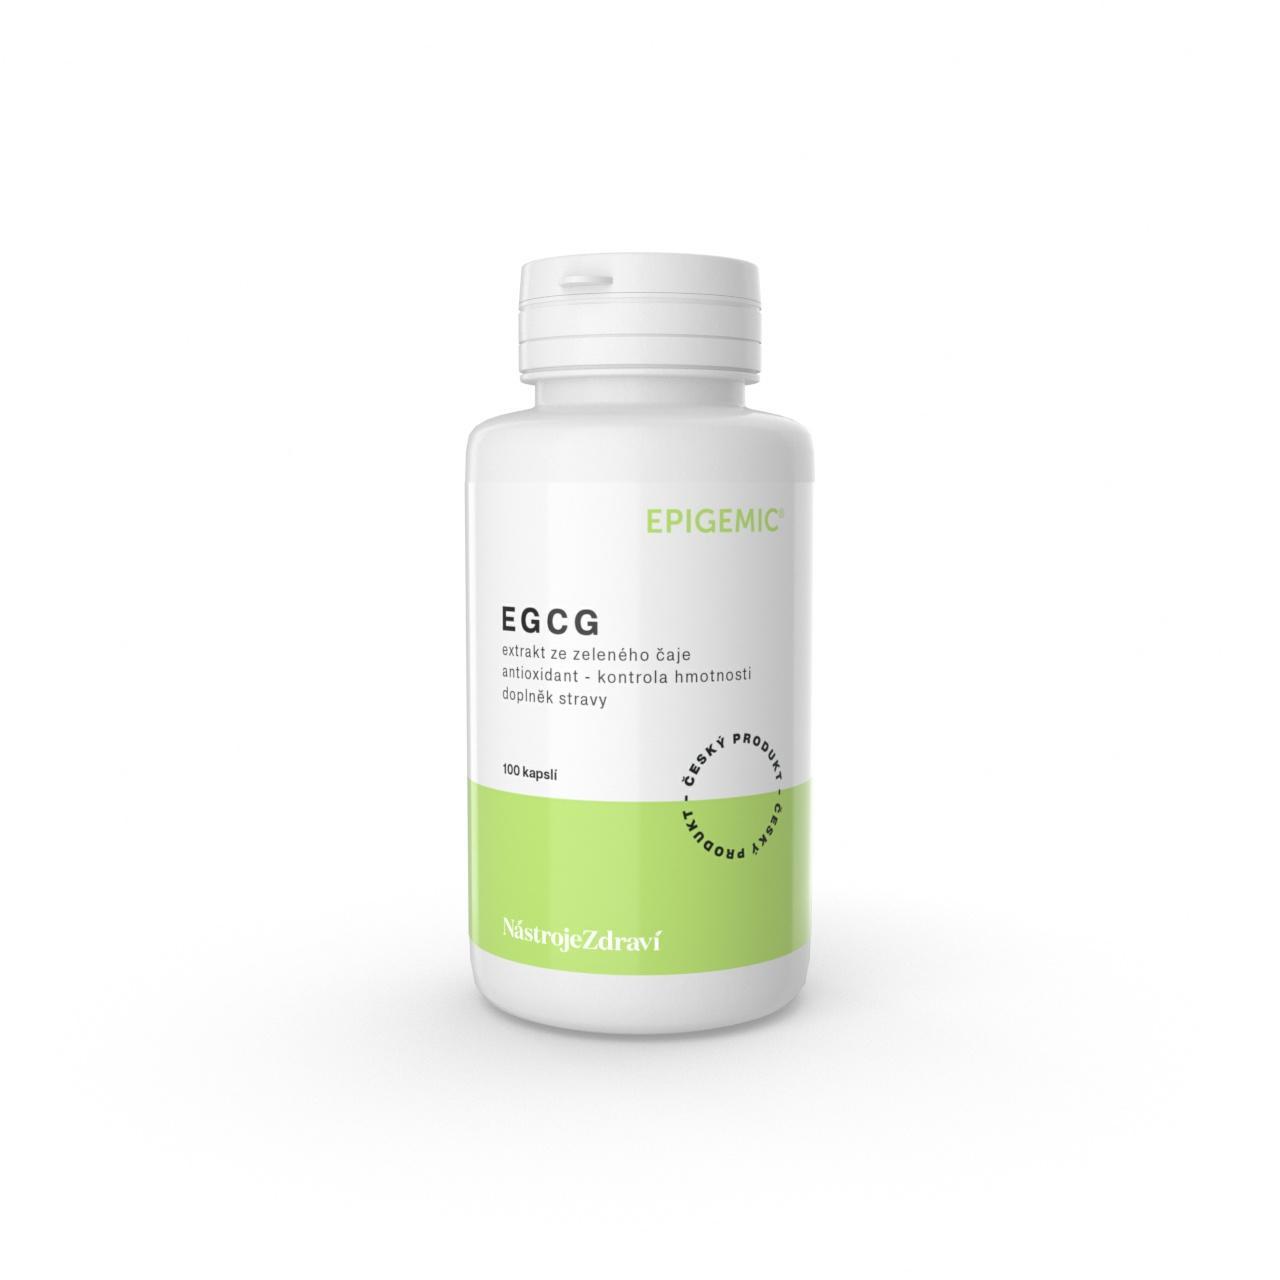 Epigemic EGCG - extrakt ze zeleného čaje, kapsle 51 g, 100 ks